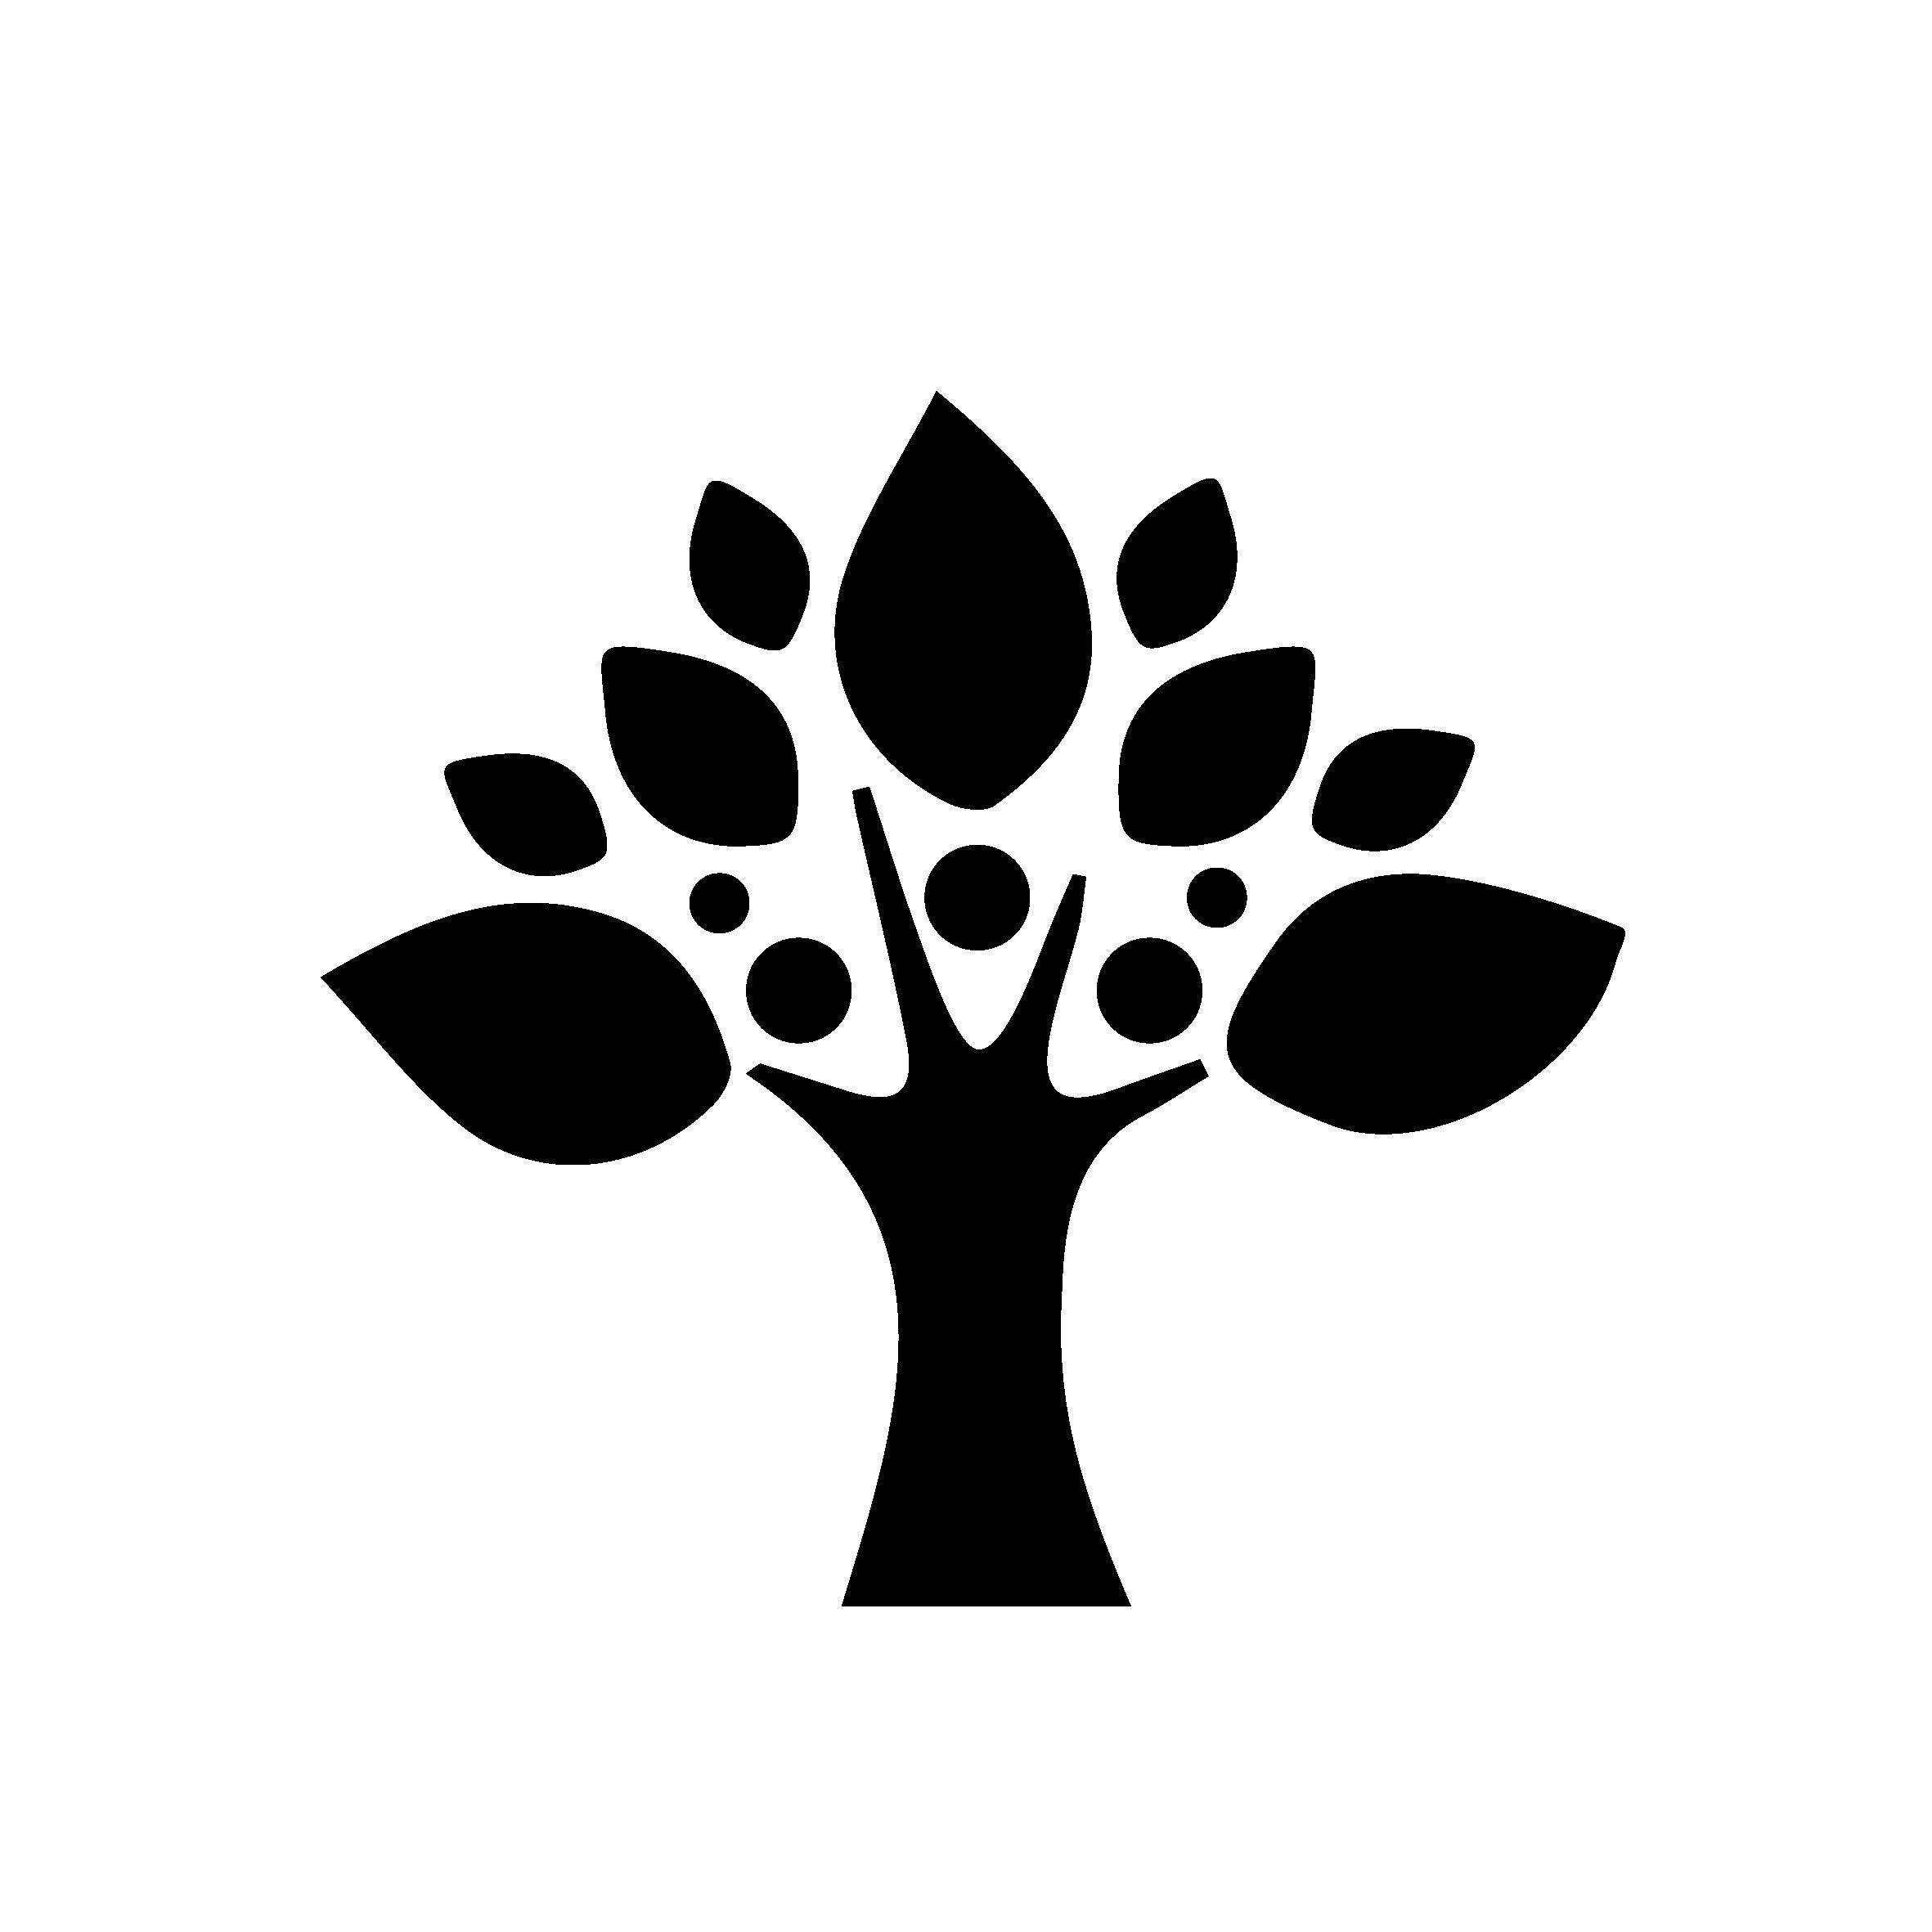 2bcf4bc04d3dbb94ae56959ca2184b27